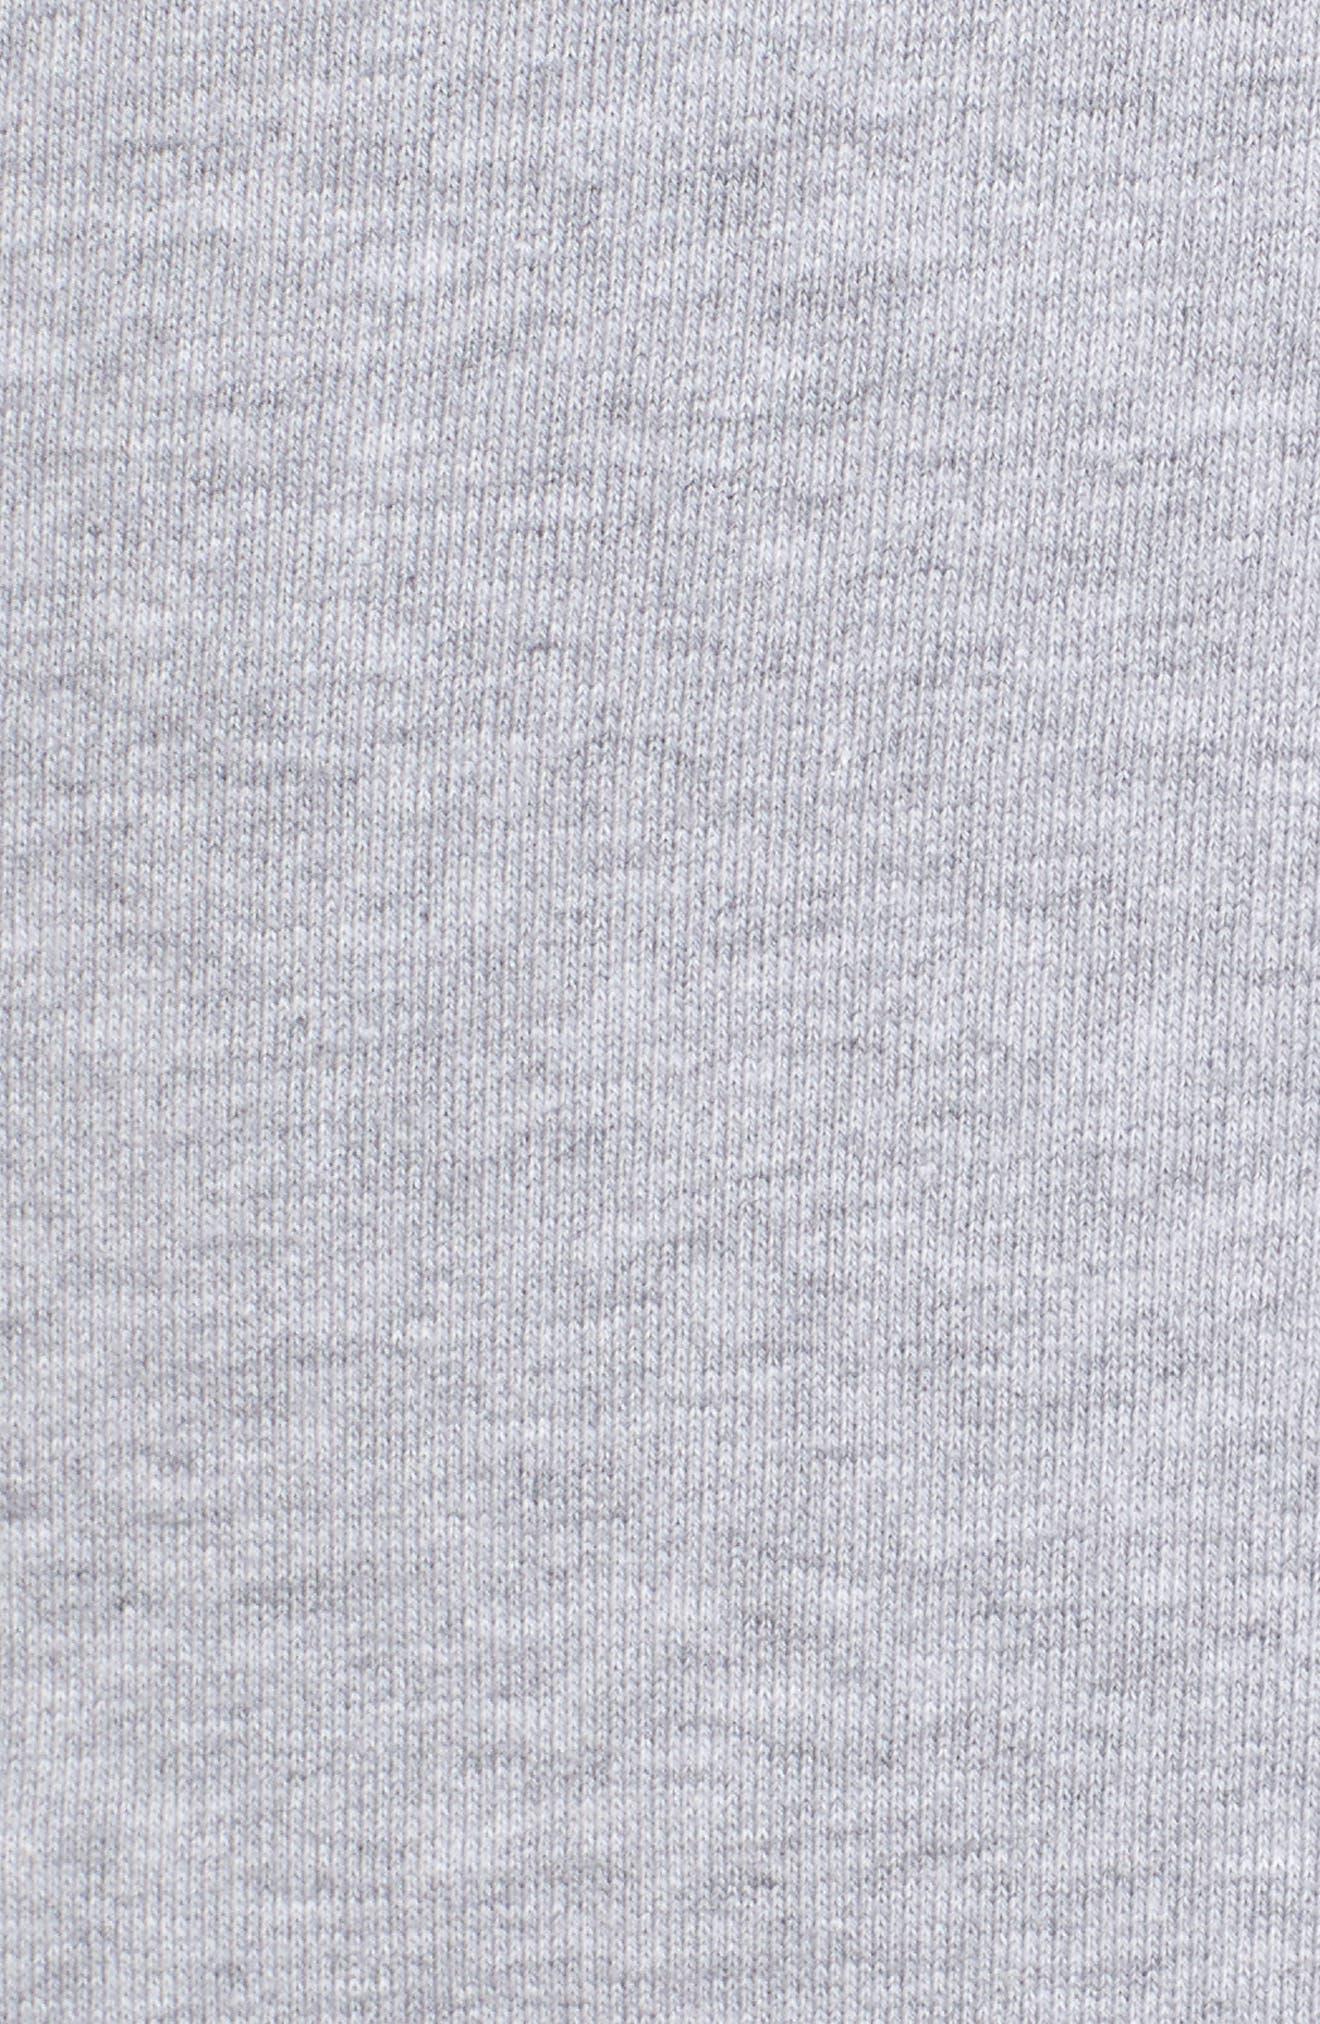 Wester Sweatshirt,                             Alternate thumbnail 5, color,                             050